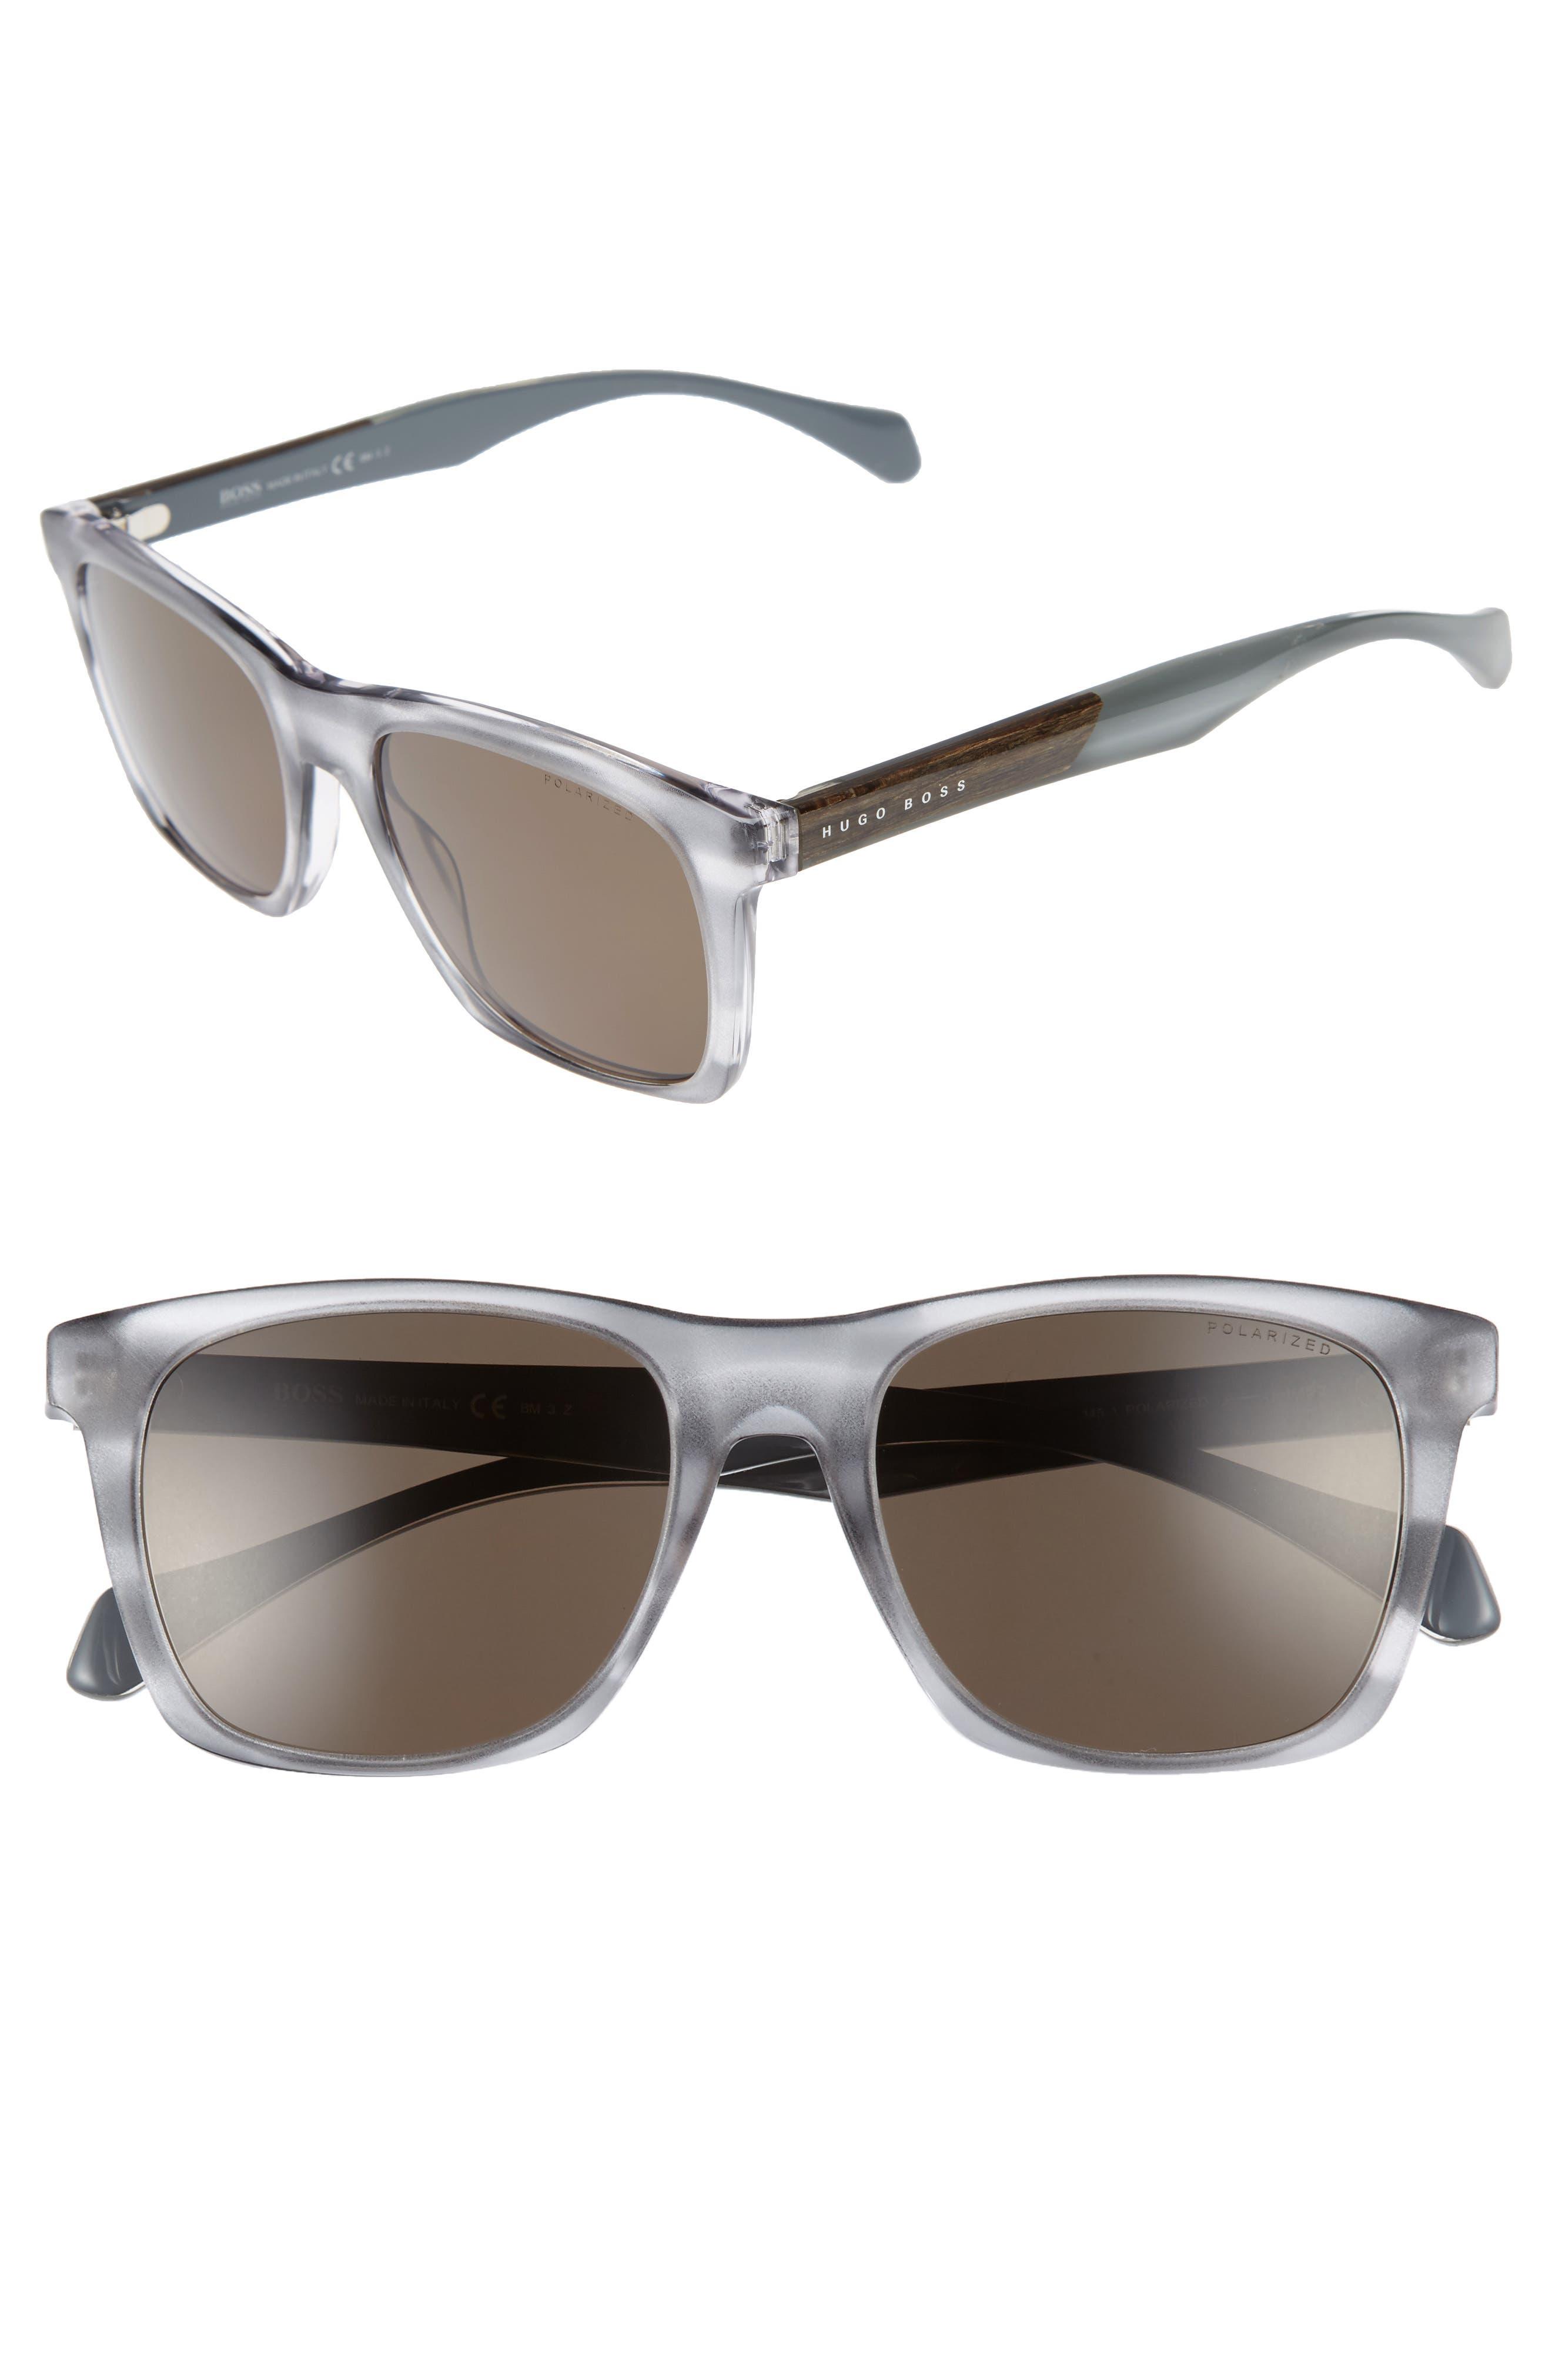 53mm Sunglasses,                             Main thumbnail 1, color,                             020